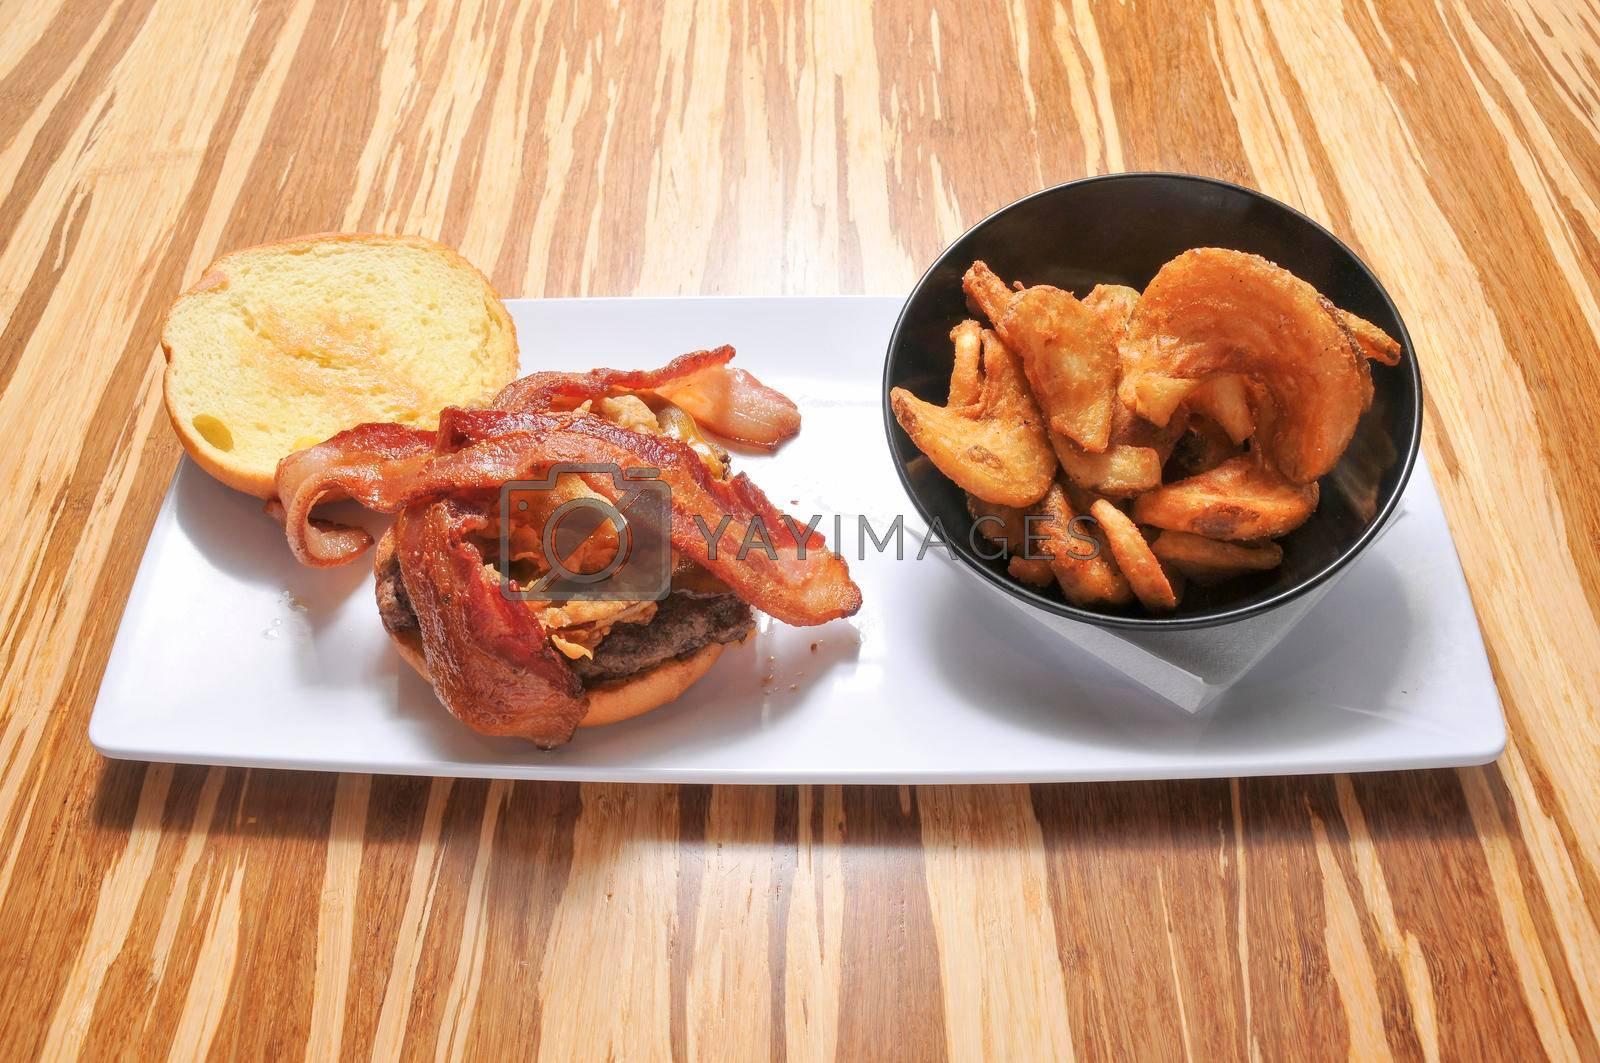 All American classic bacon cheeseburger on a sesame seed bun.